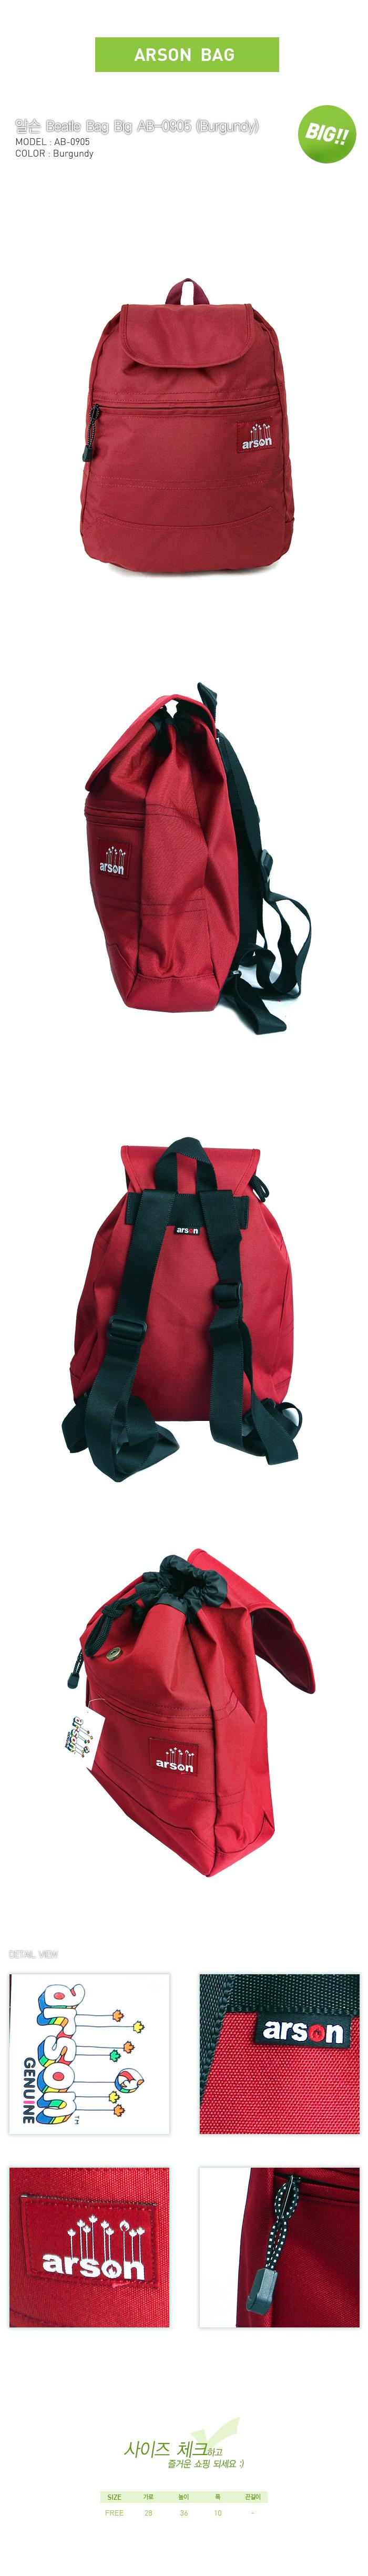 [ ARSON ] AB-0905(勃艮第)背包书包